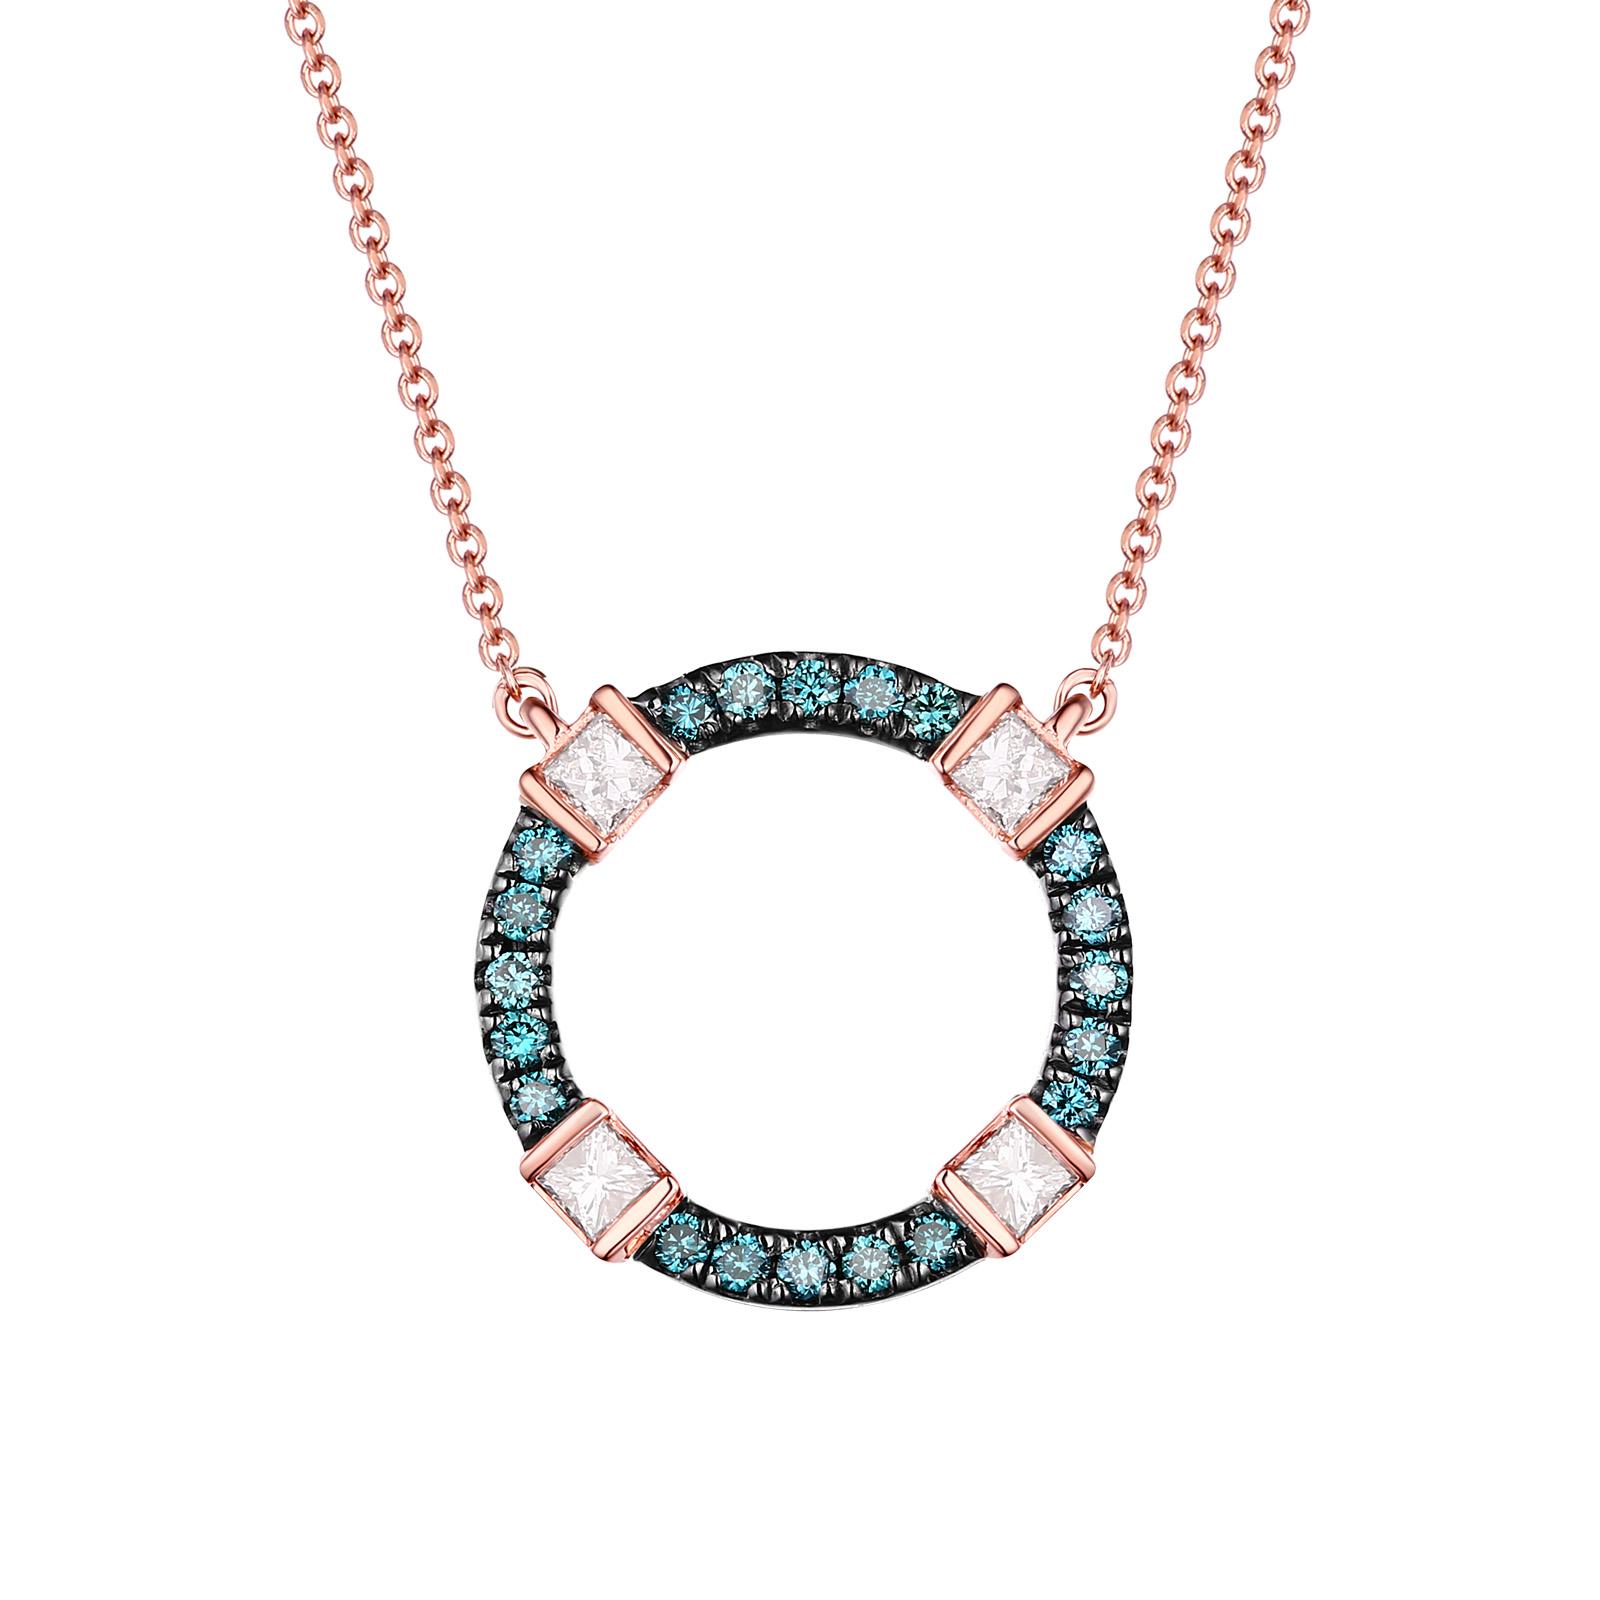 NL24920WIC- 14K Rose Gold Diamond Necklace, 0.31 TCW